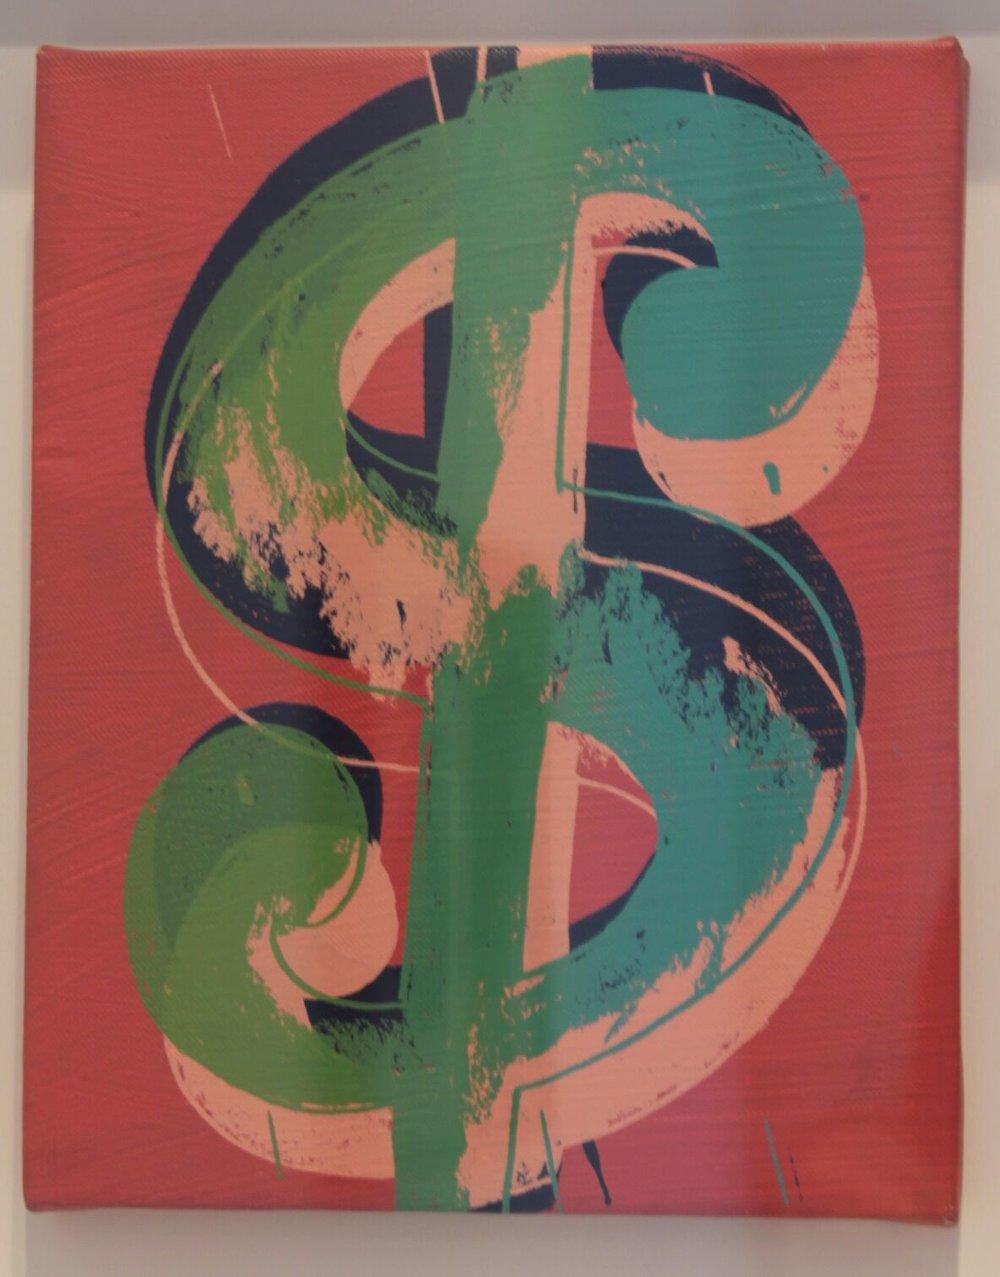 Dollar Sign,   1982  Técnica mixta sobre lienzo  25 x 20 cm   NOT FOR SALE